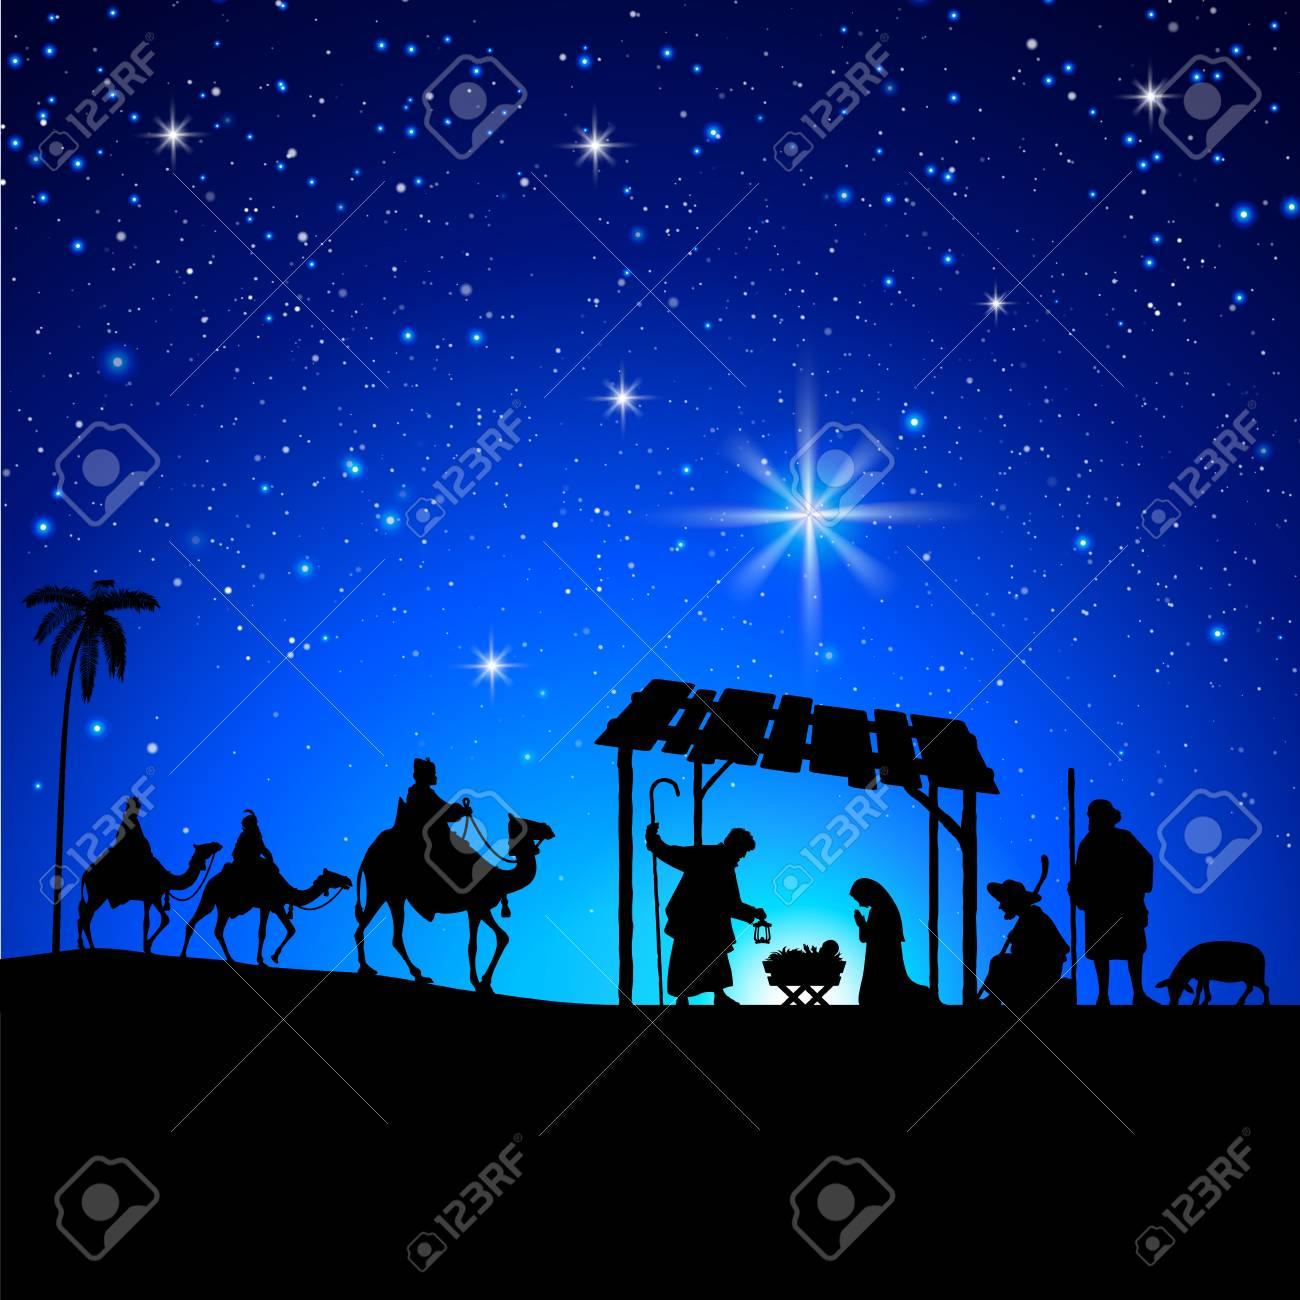 High detail Vector nativity Christmas Scene under a sky full of stars background - 85862383